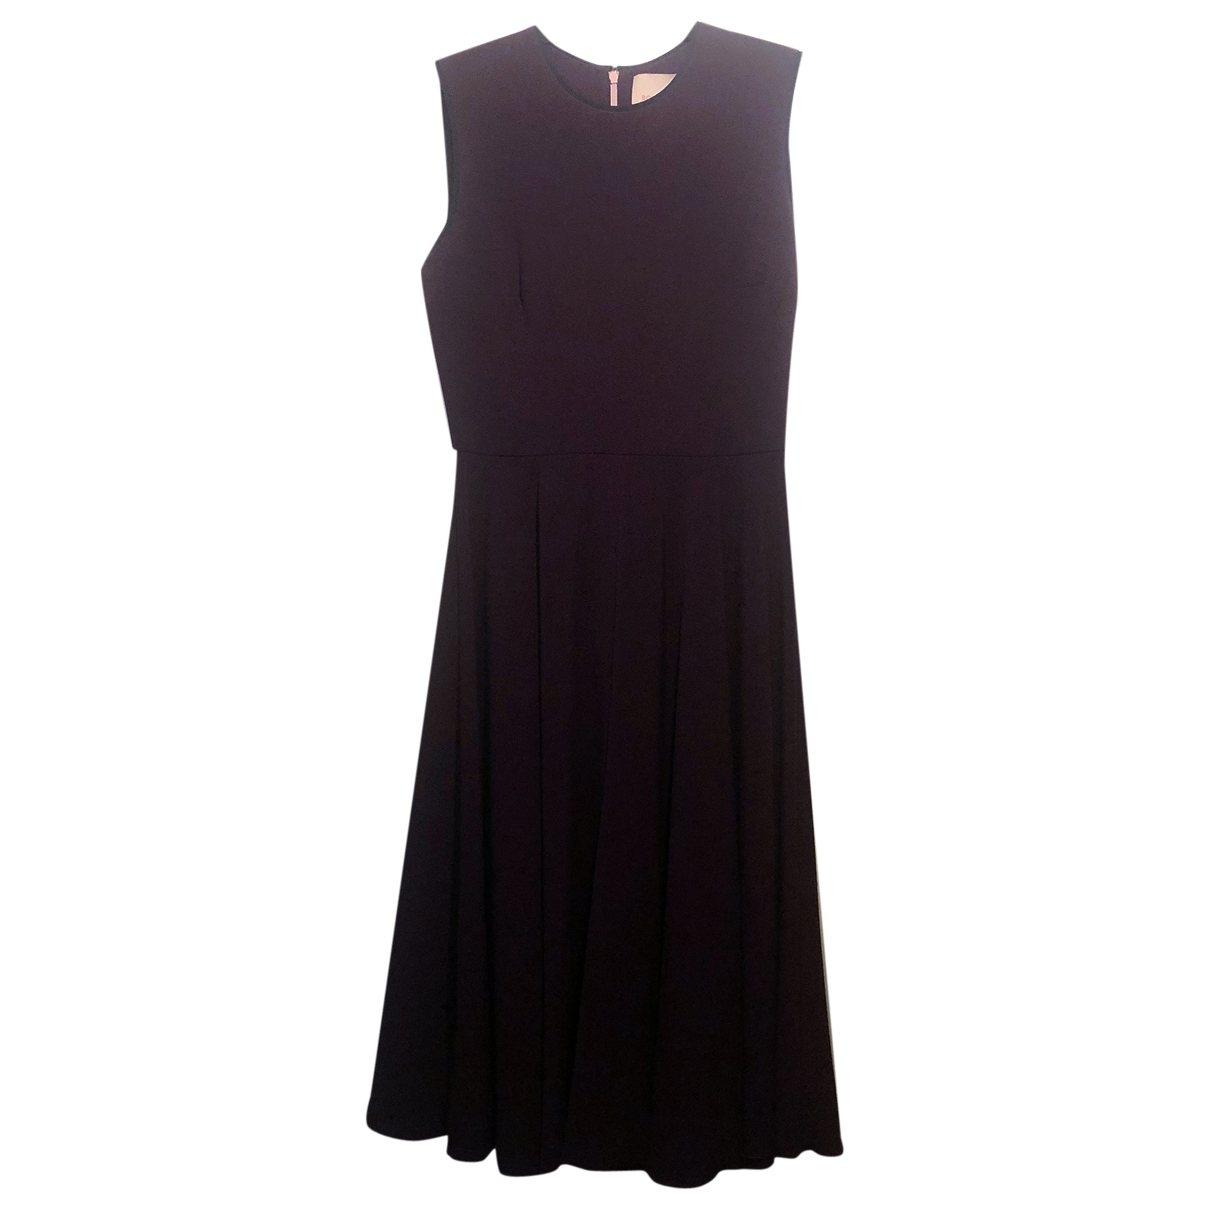 Roksanda \N Purple dress for Women 8 UK